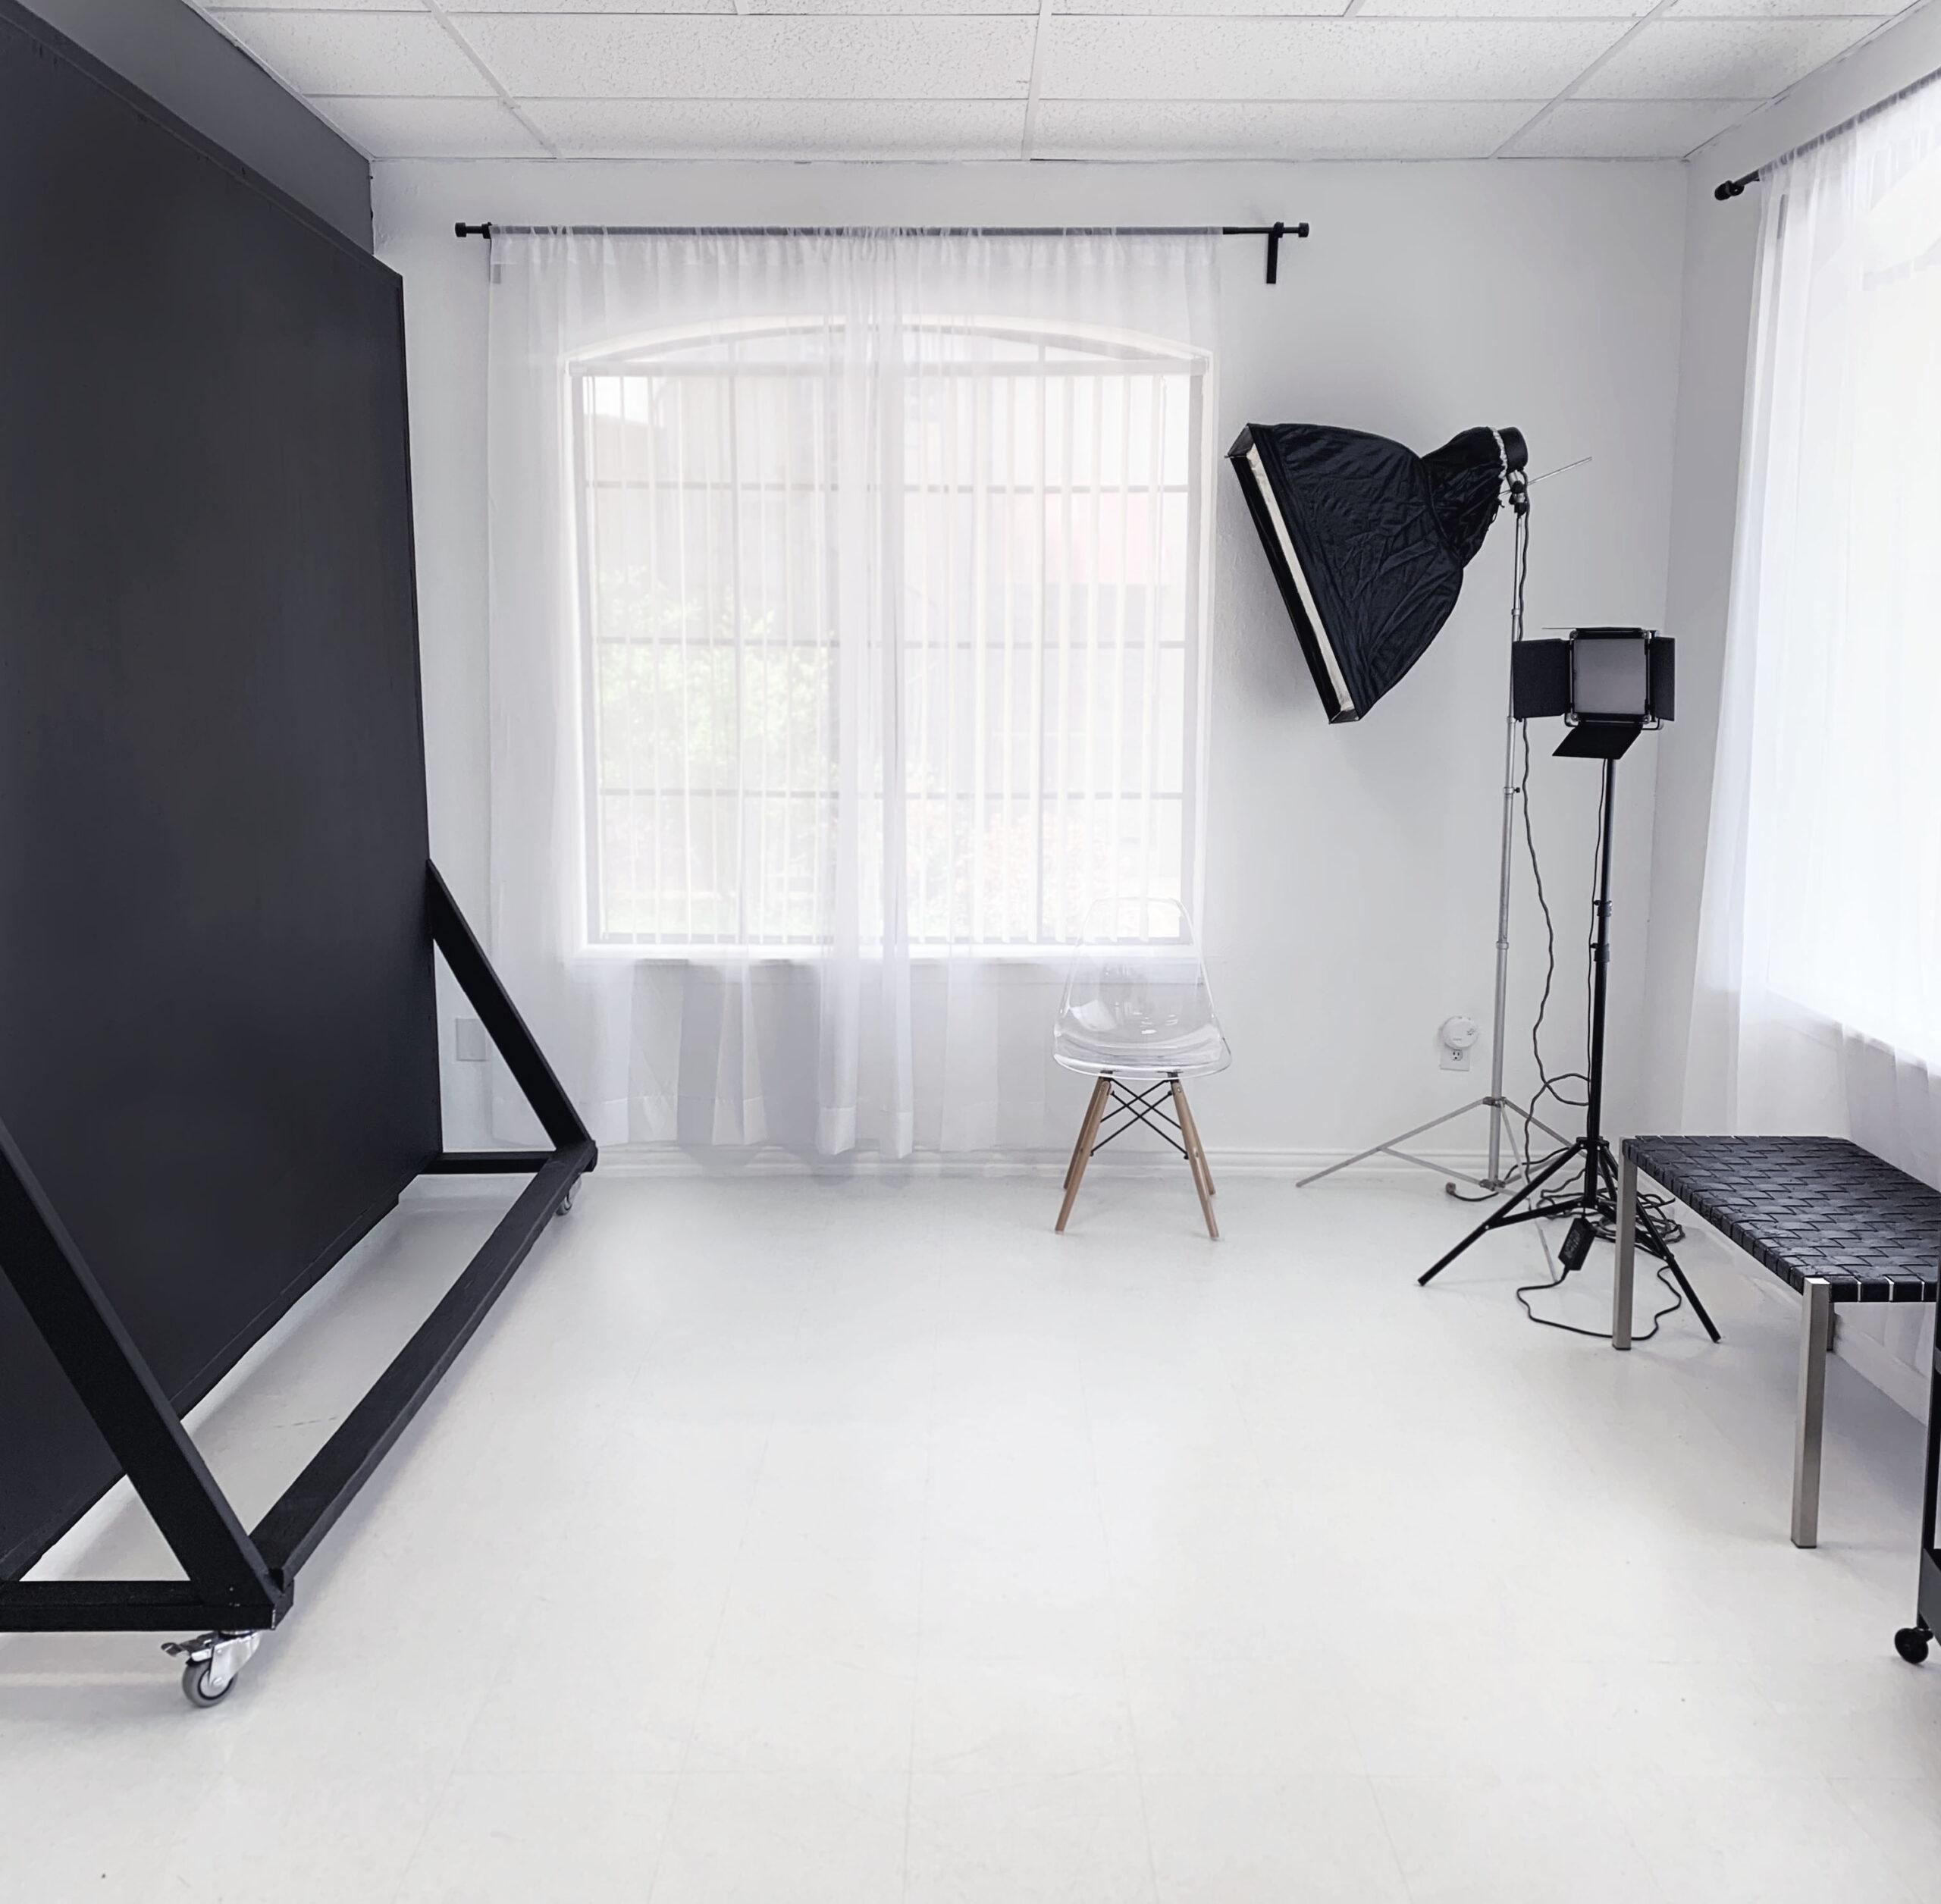 Black Moveable Backdrop at Sun Catcher Studio